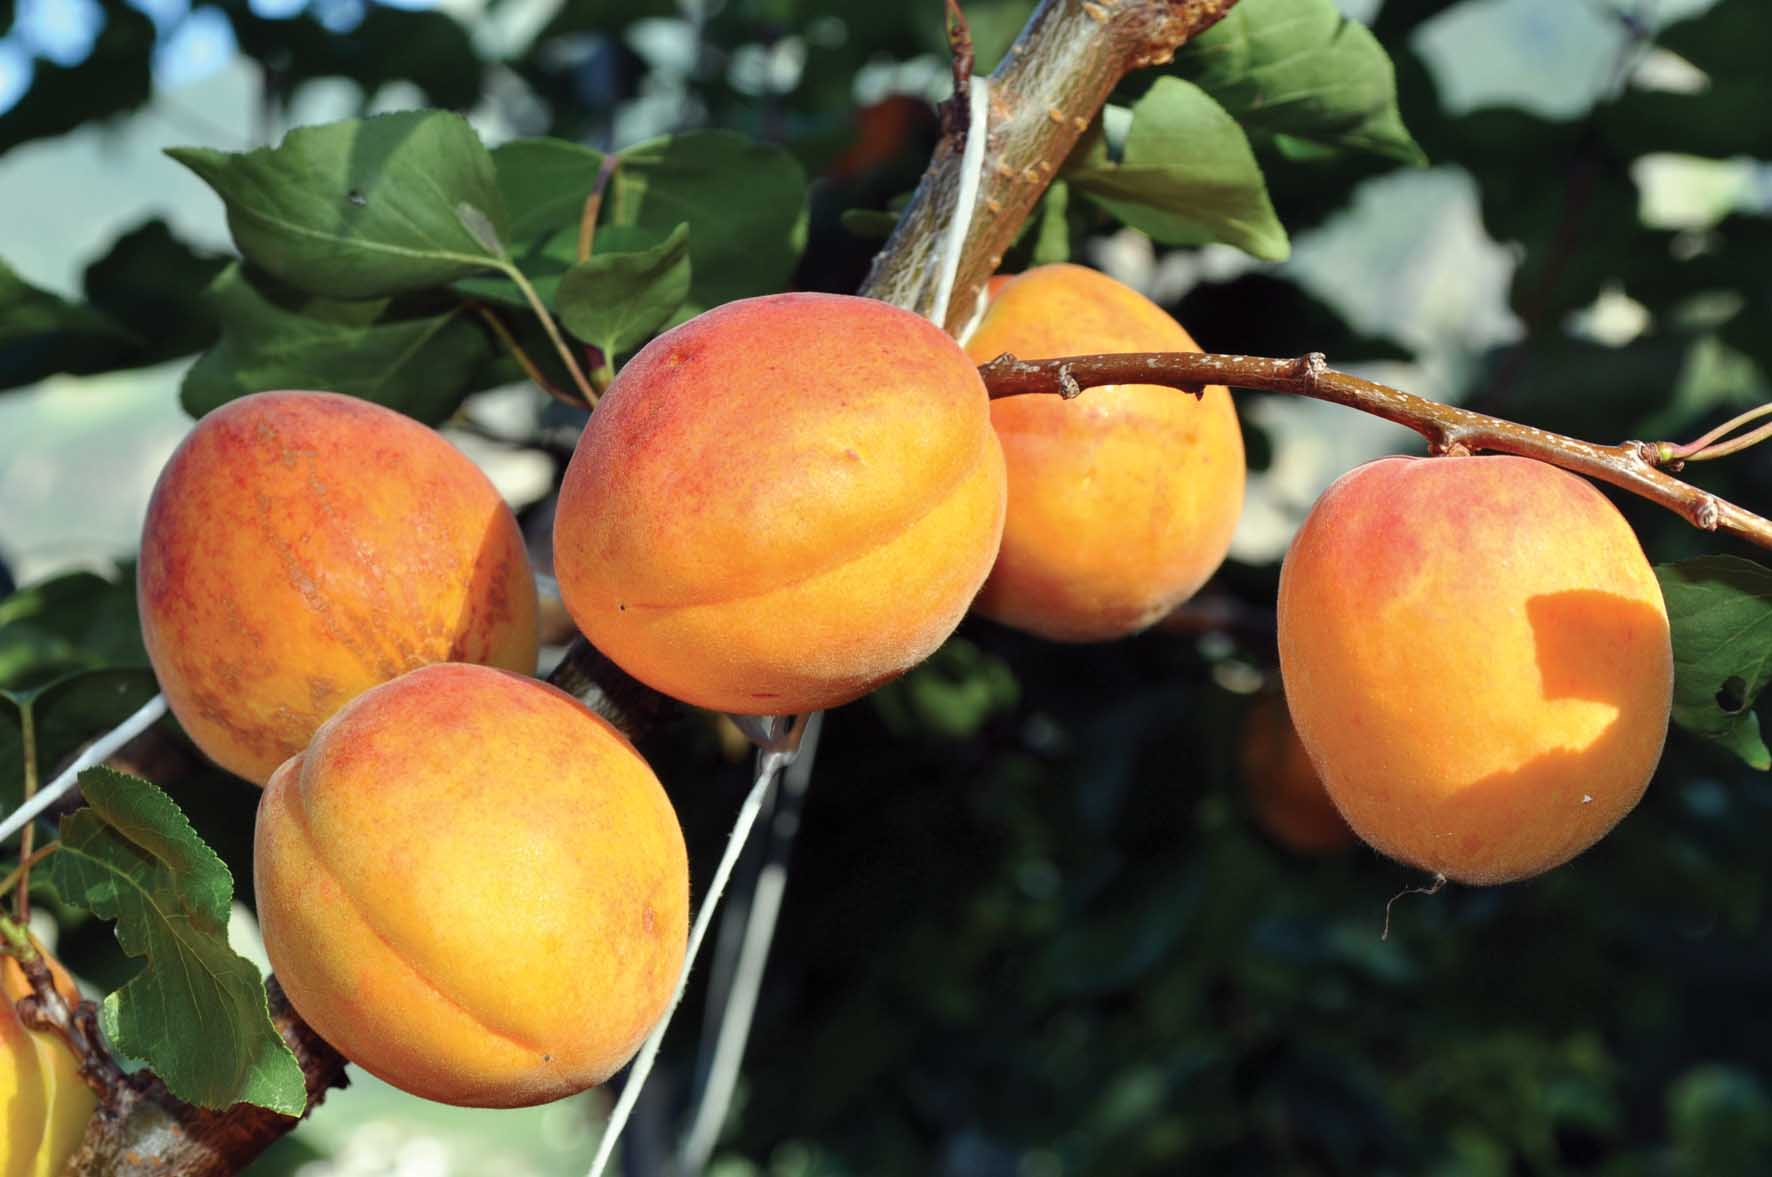 frutta-drupacee-albicocche-ilnordest